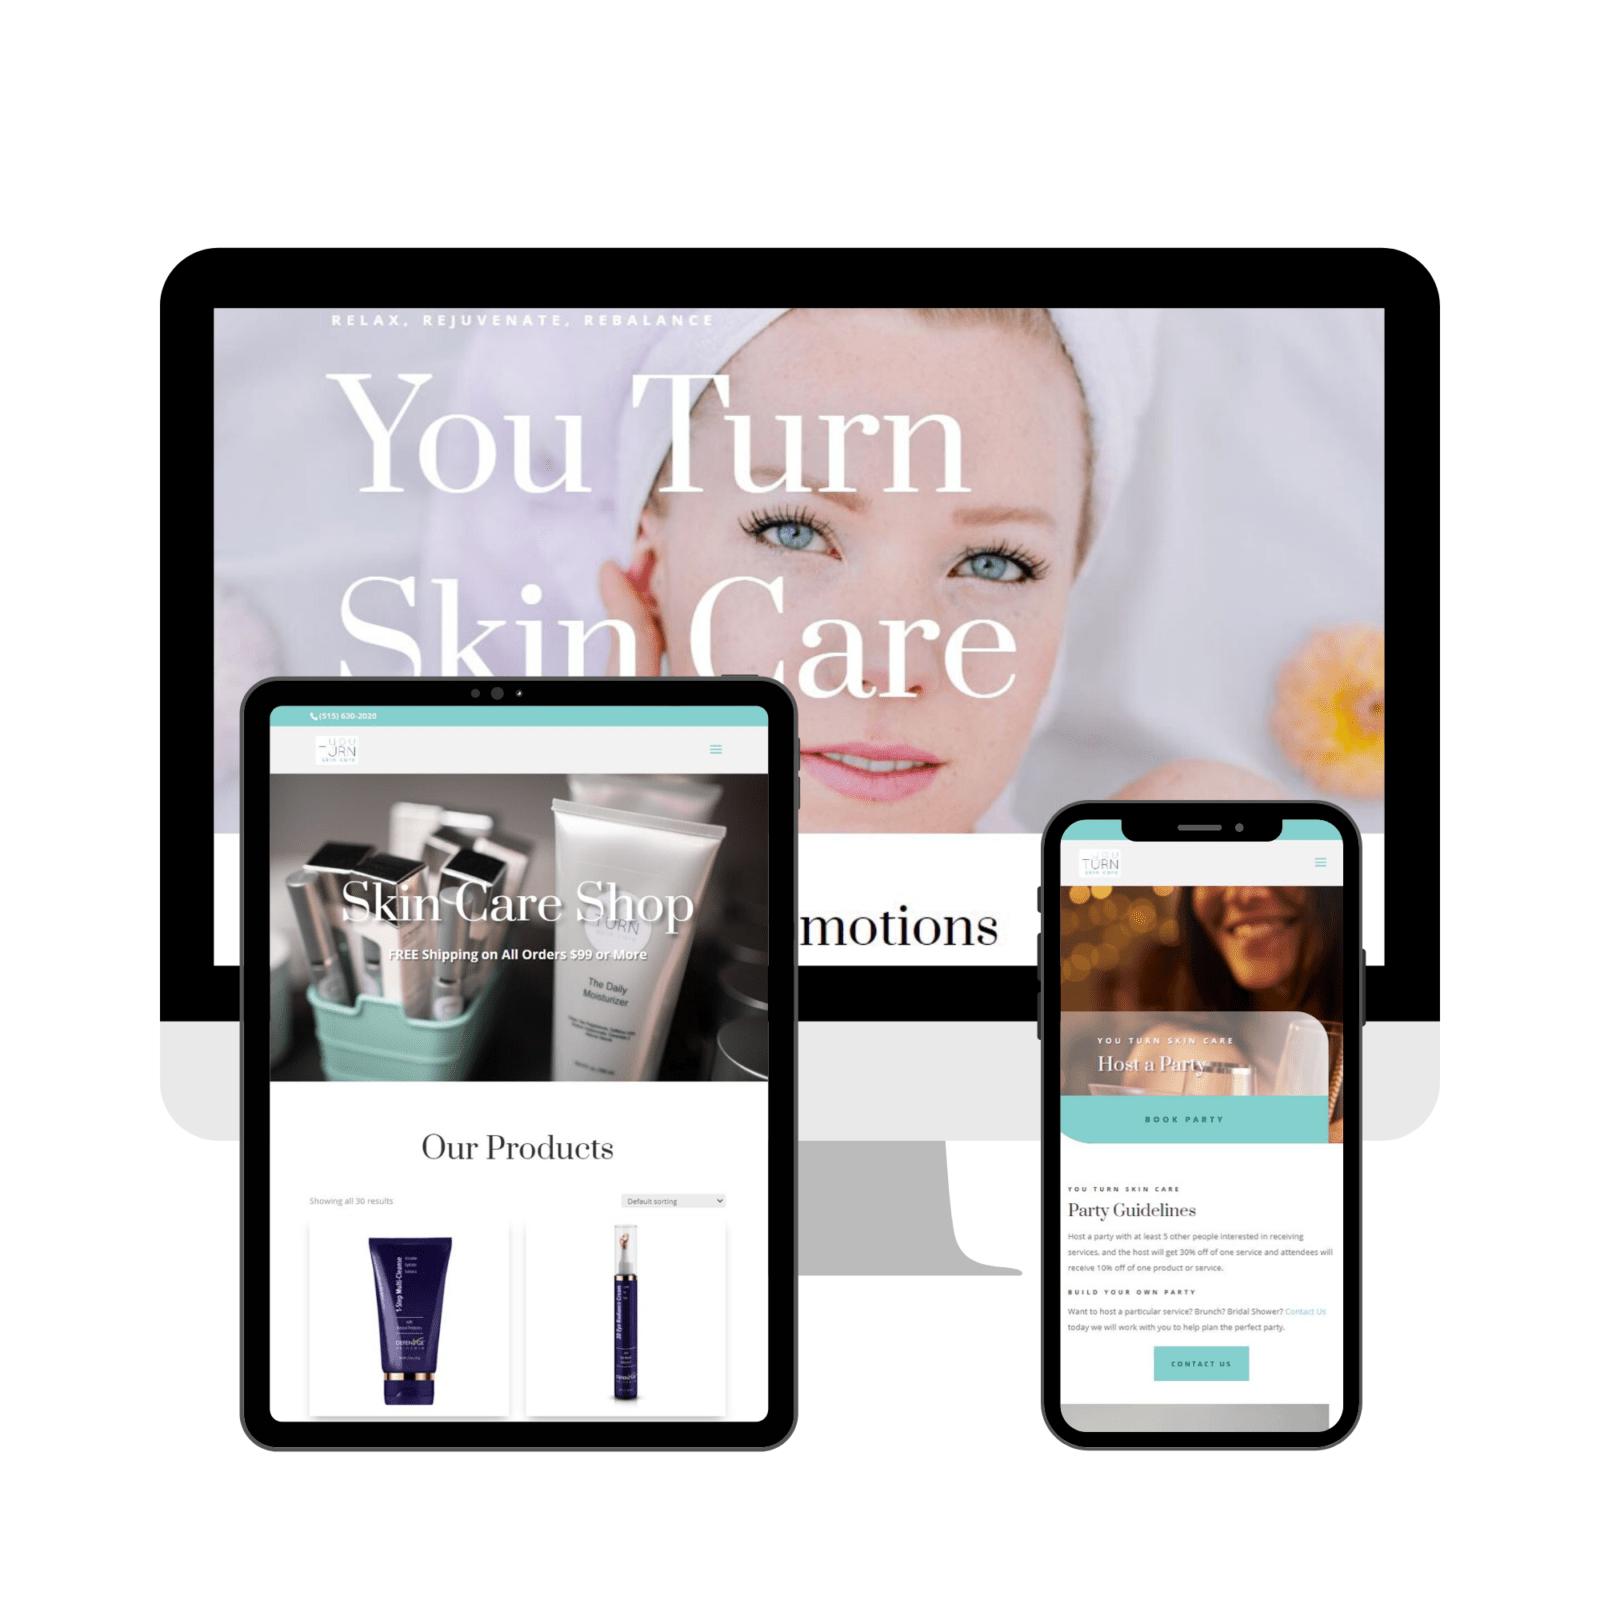 YouTurn Skin Care